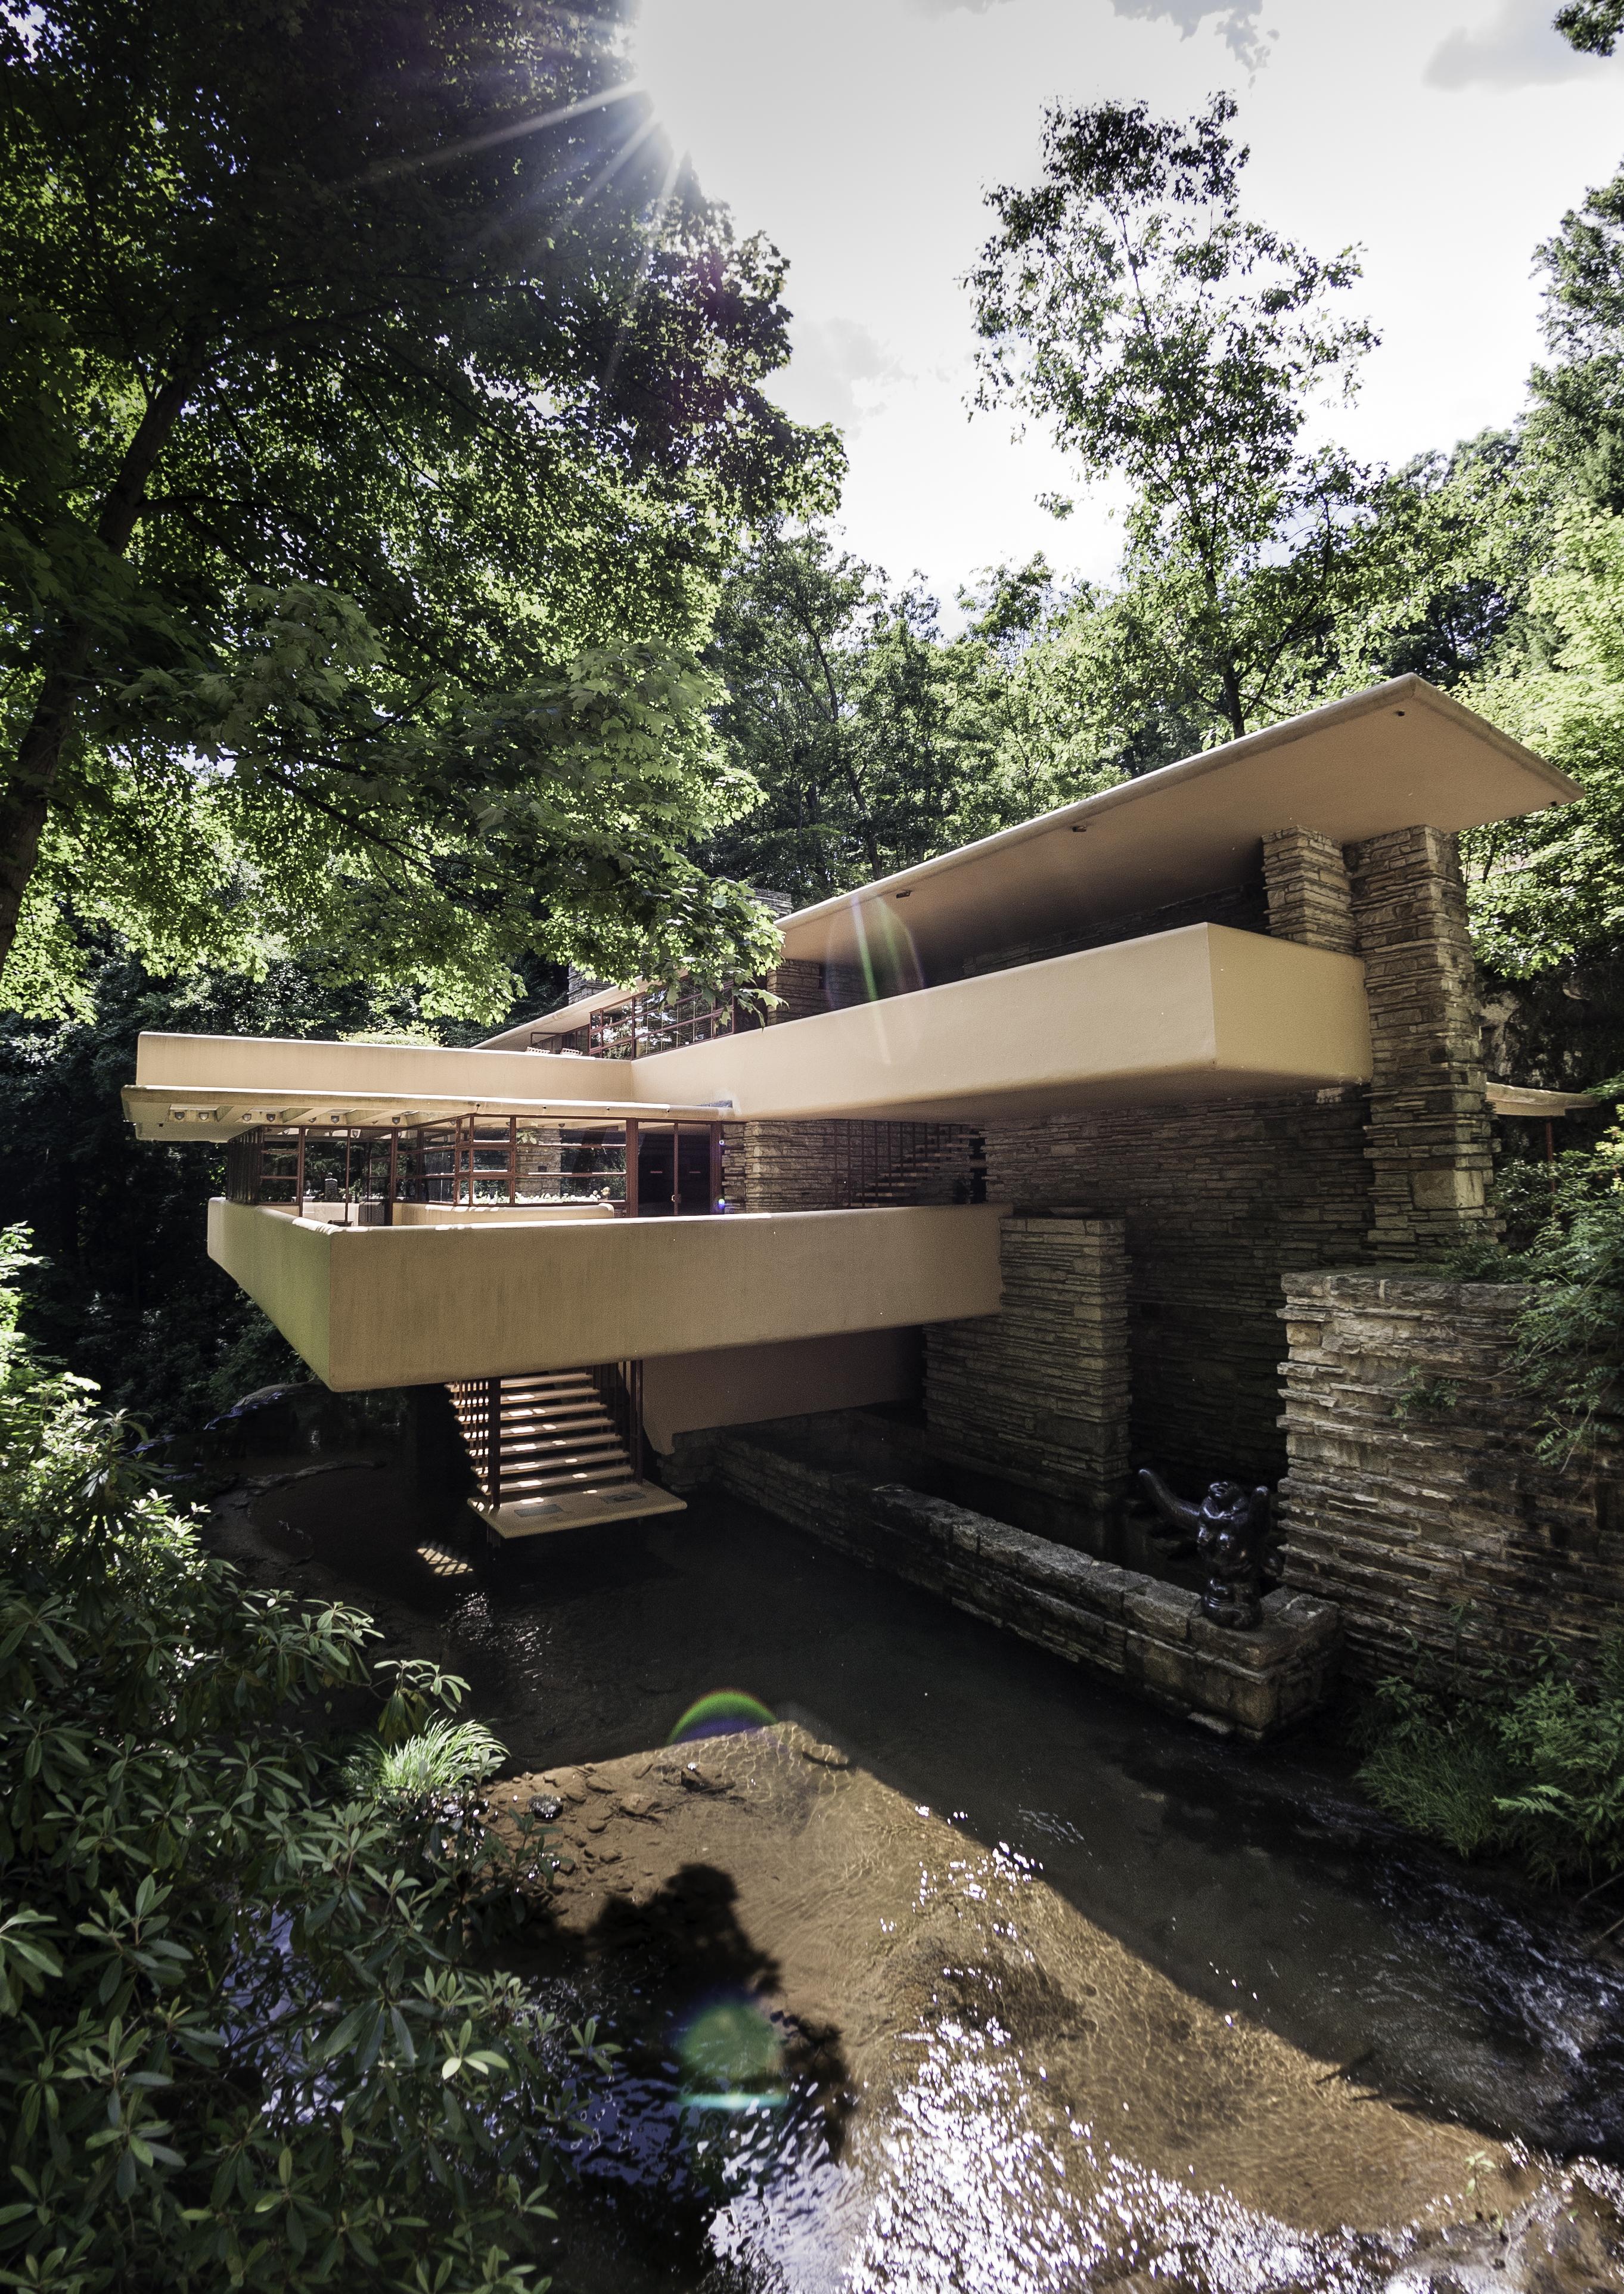 falling water kaufman house by rubrduk on deviantart. Black Bedroom Furniture Sets. Home Design Ideas